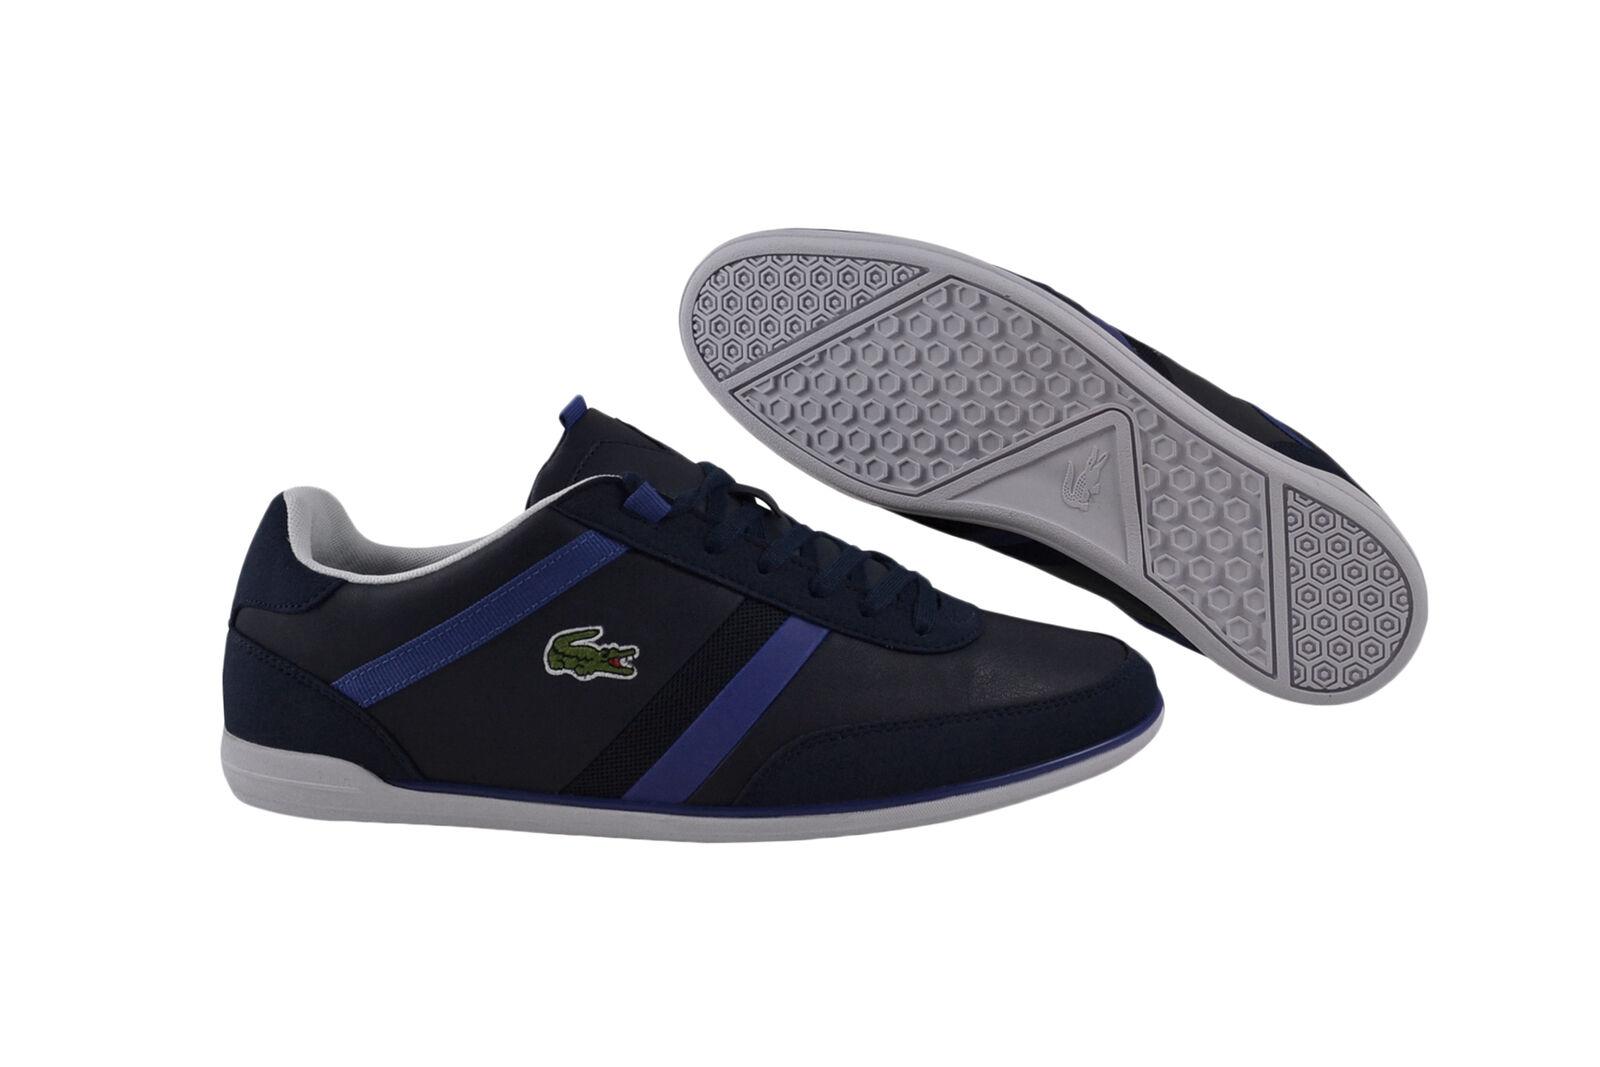 Lacoste Giron 116 1 SPM navy Sneaker/Schuhe blau